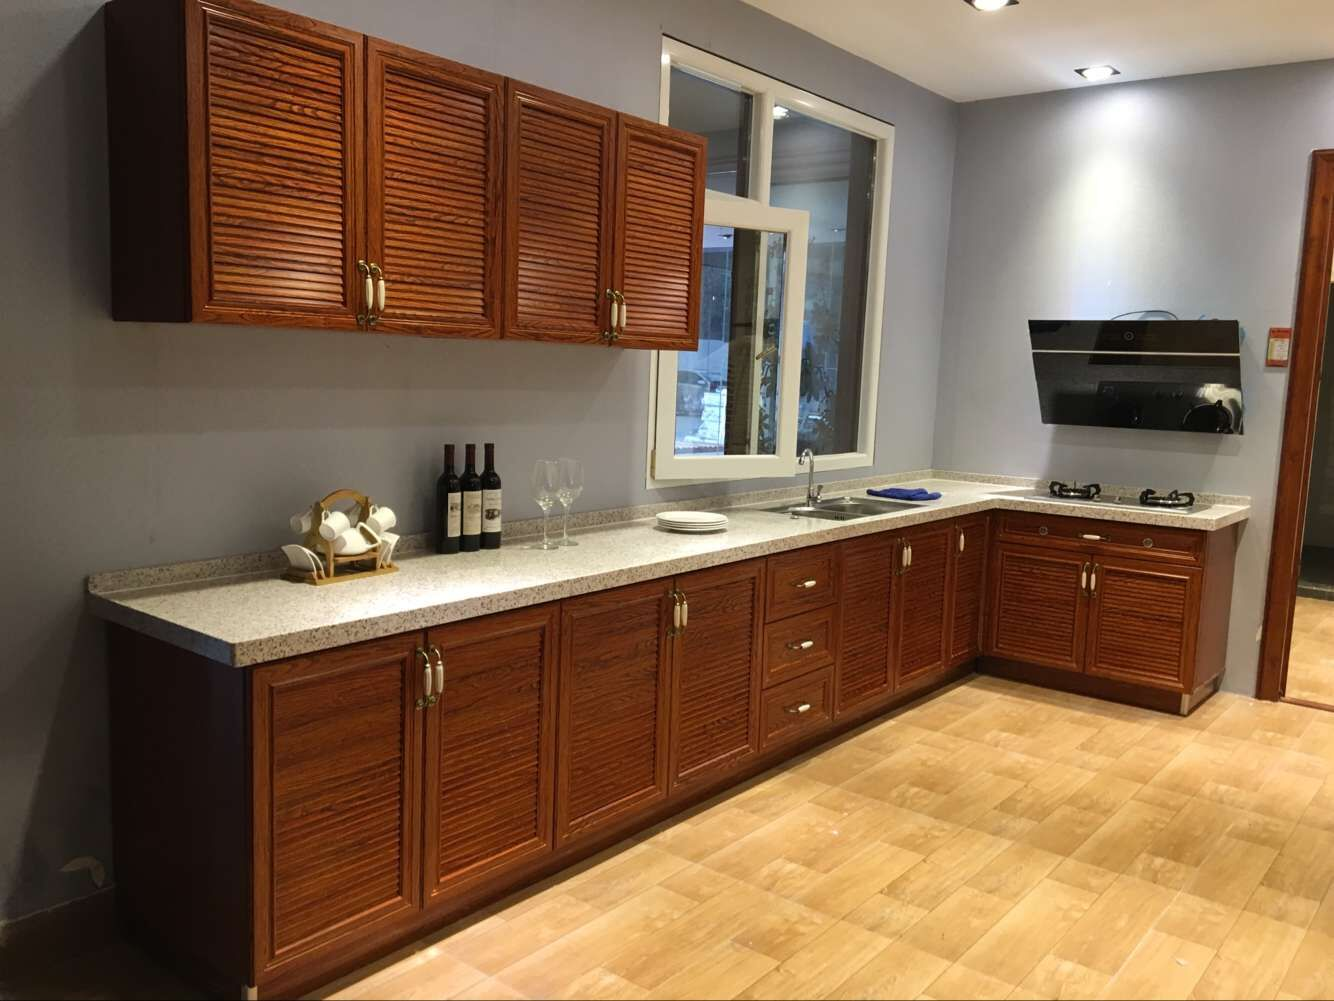 Kabinet Dapur Luar Ruangan Furnitur Kualitas Tinggi Pintu Kabinet Dapur Tahan Air Aluminium Aloi Buy Kualitas Tinggi Furniture Dapur Pintu Lemari Tahan Air Outdoor Kitchen Kabinet Product On Alibaba Com